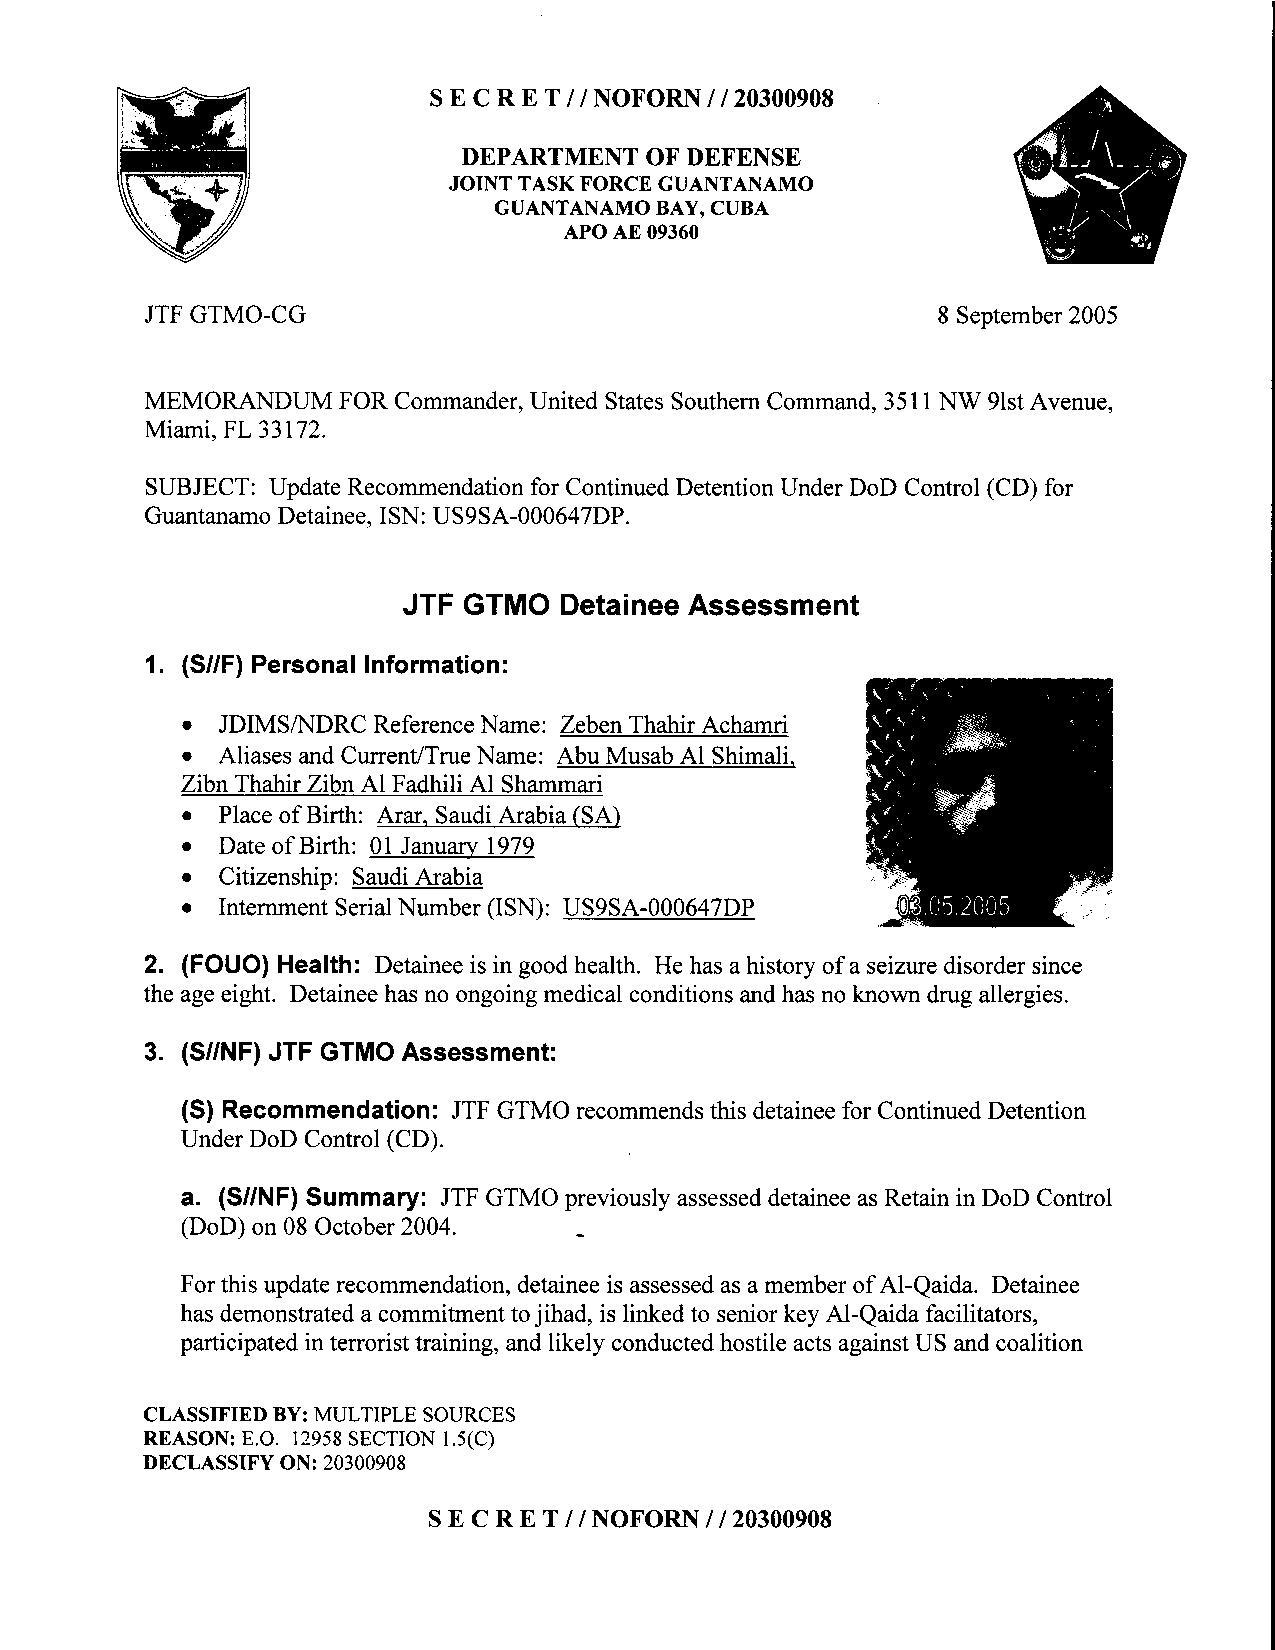 ISN 00647, Zeben Thahir Achamri's Guantanamo detainee assessment.pdf